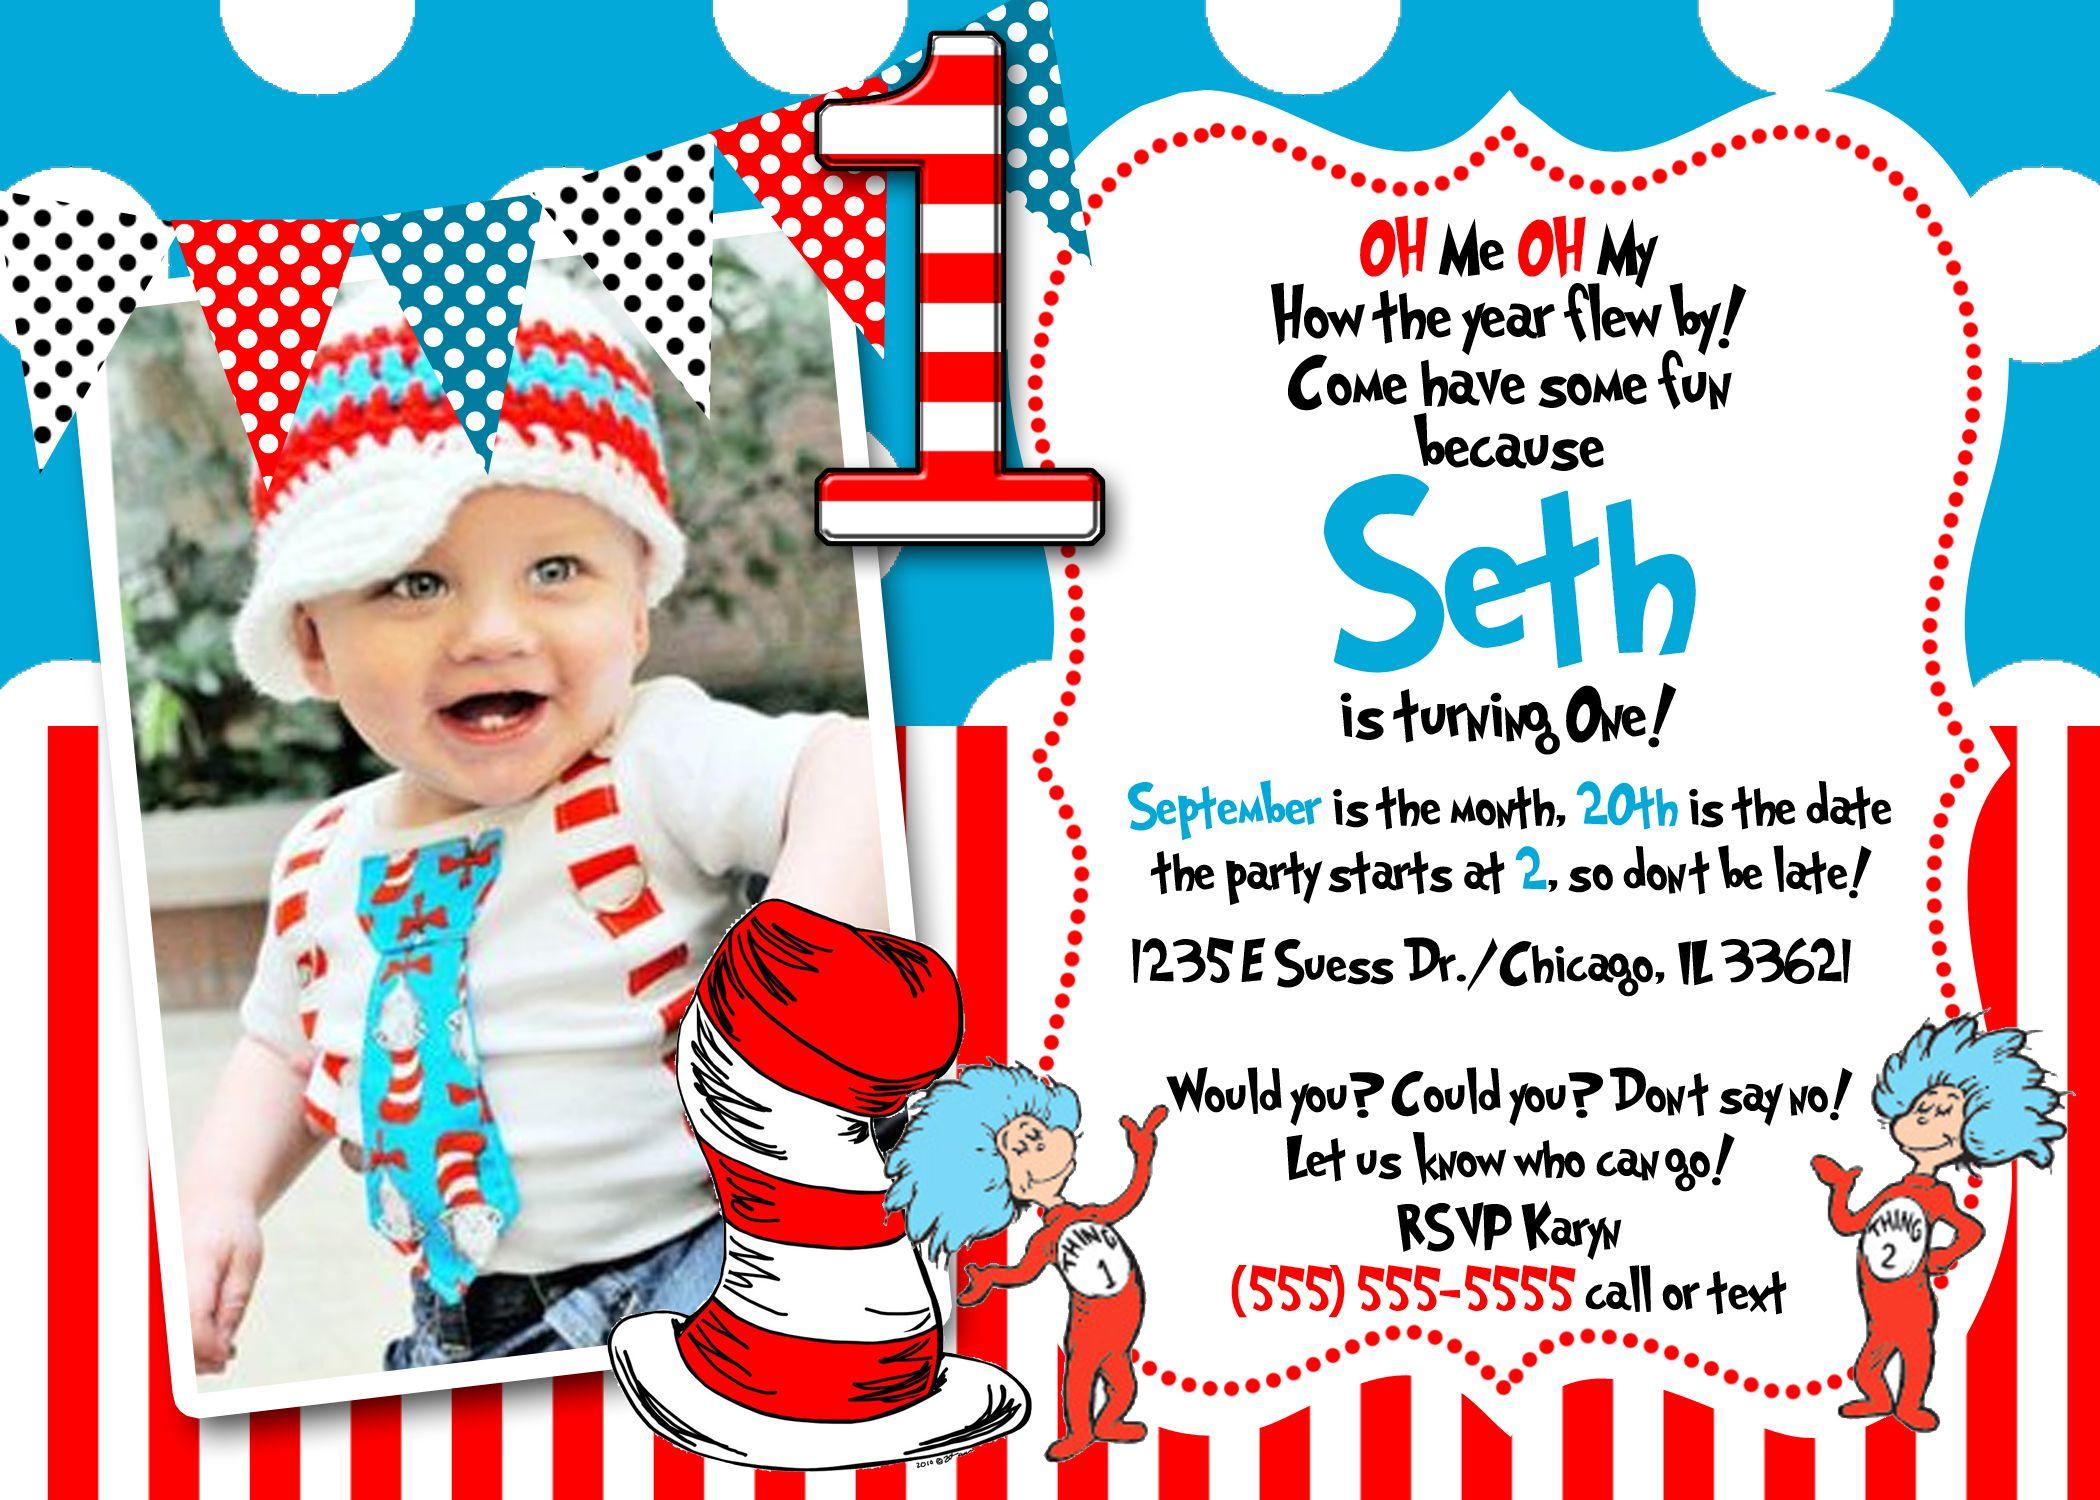 Dr Seuss First Birthday Invitations | Baby Shower Invitation Ideas | Pinterest | Birthdays, Dr ...